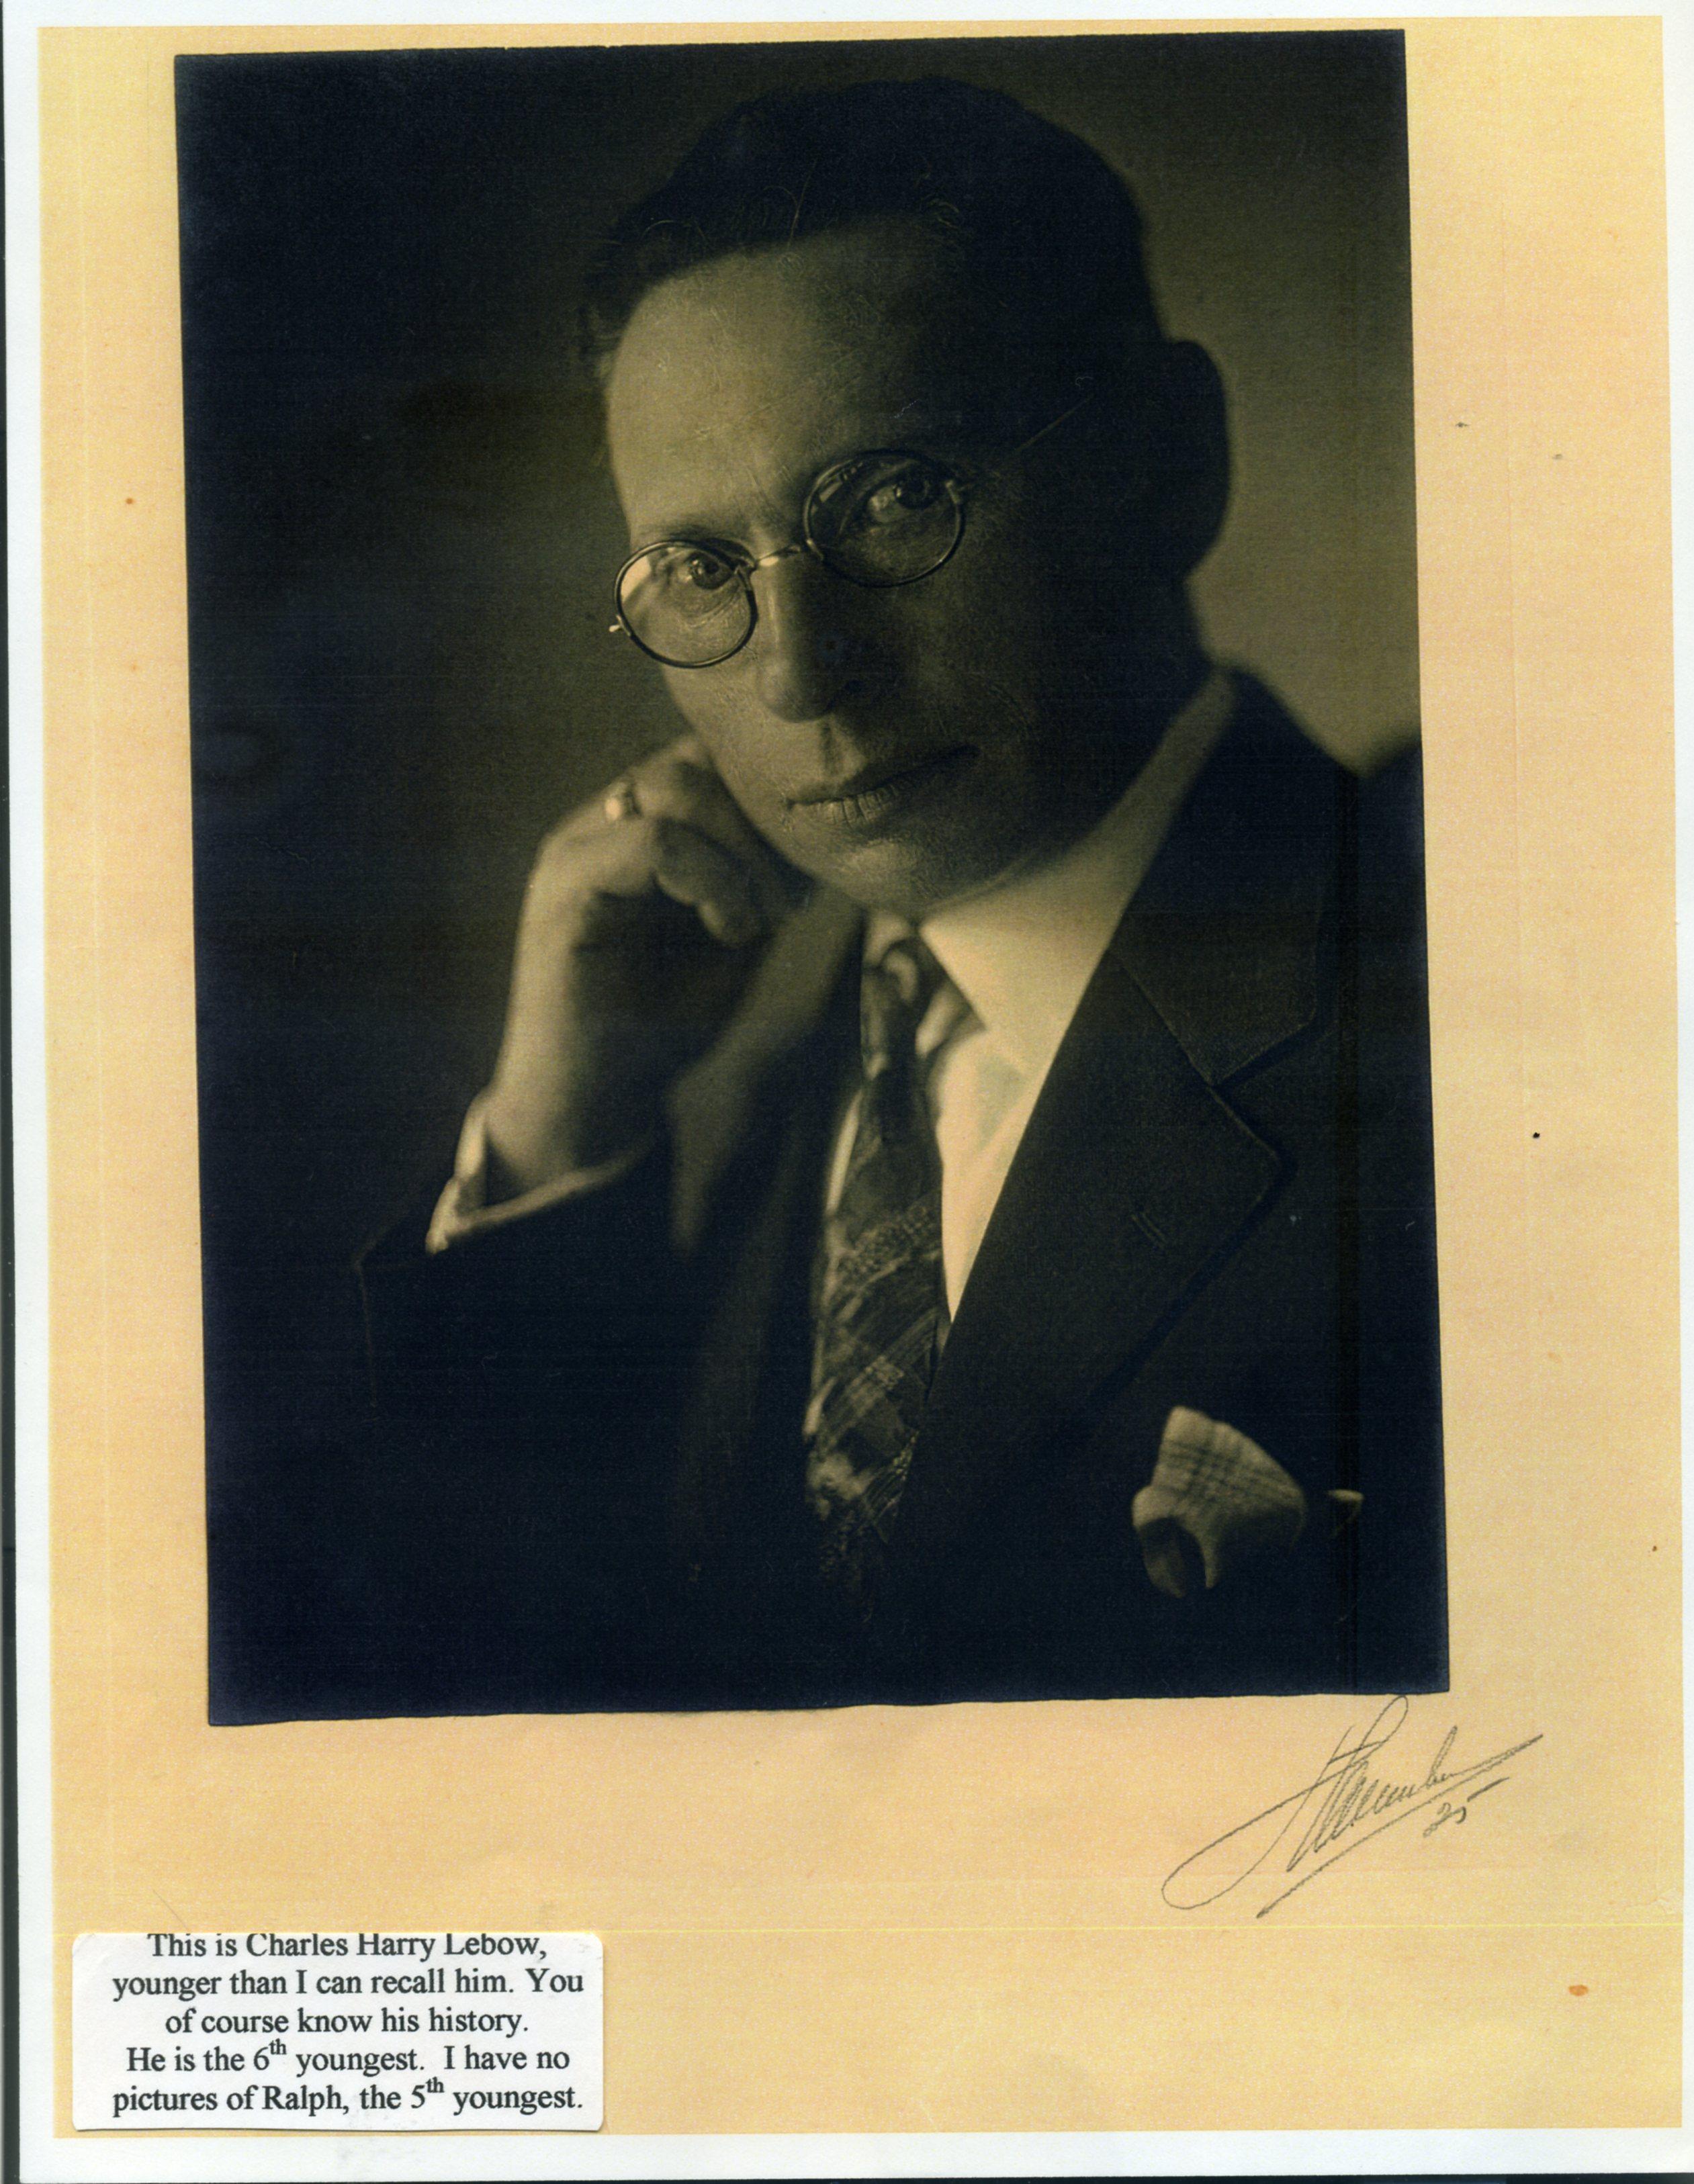 Charles Harry Lebow